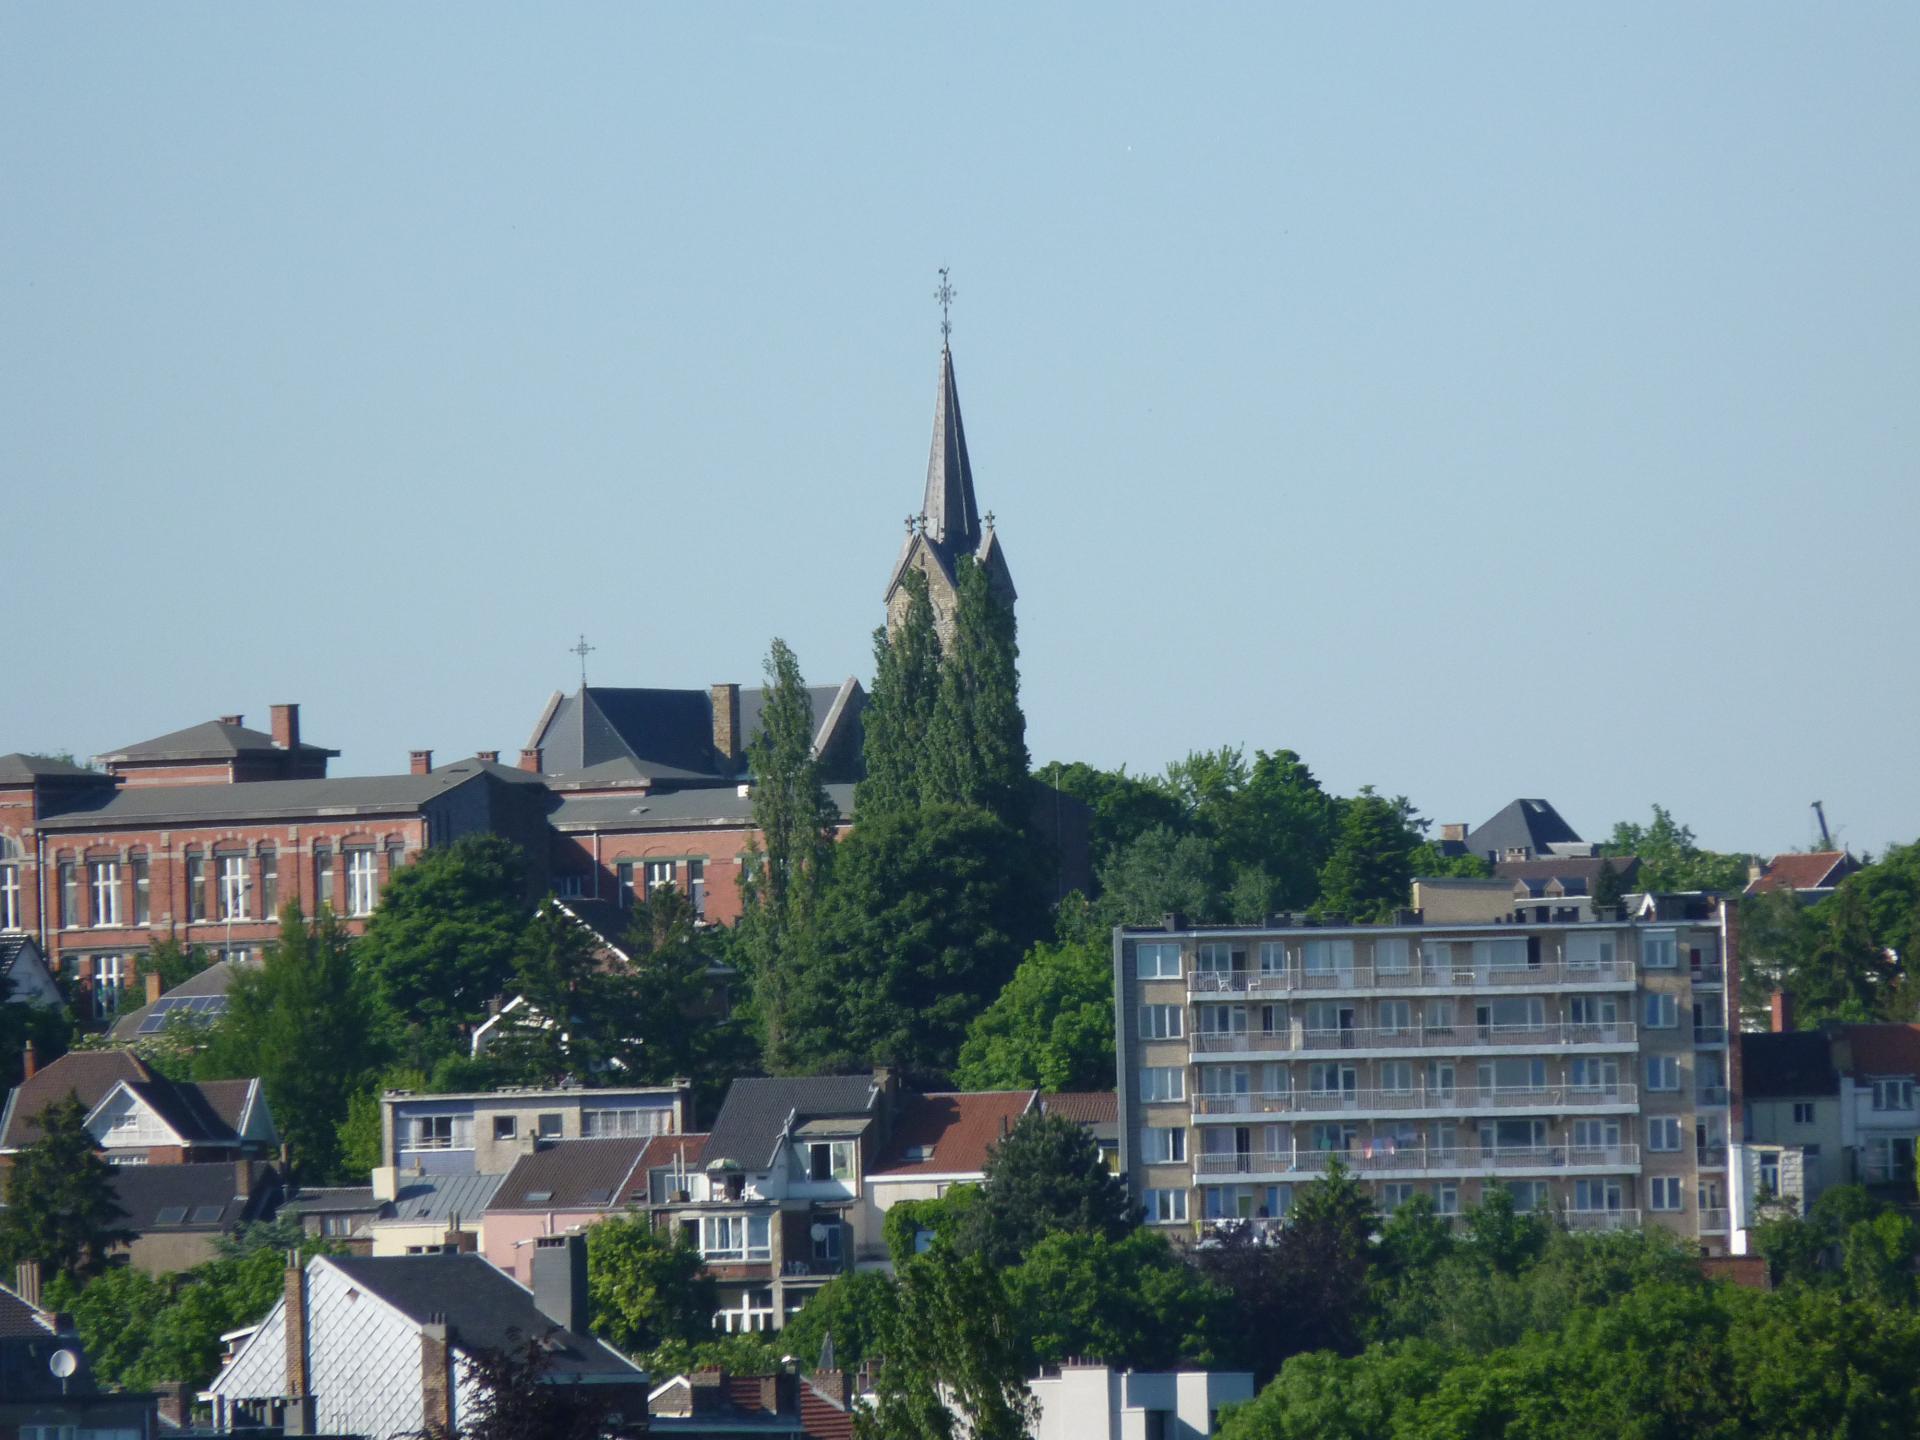 Eglise Ste-Walburge